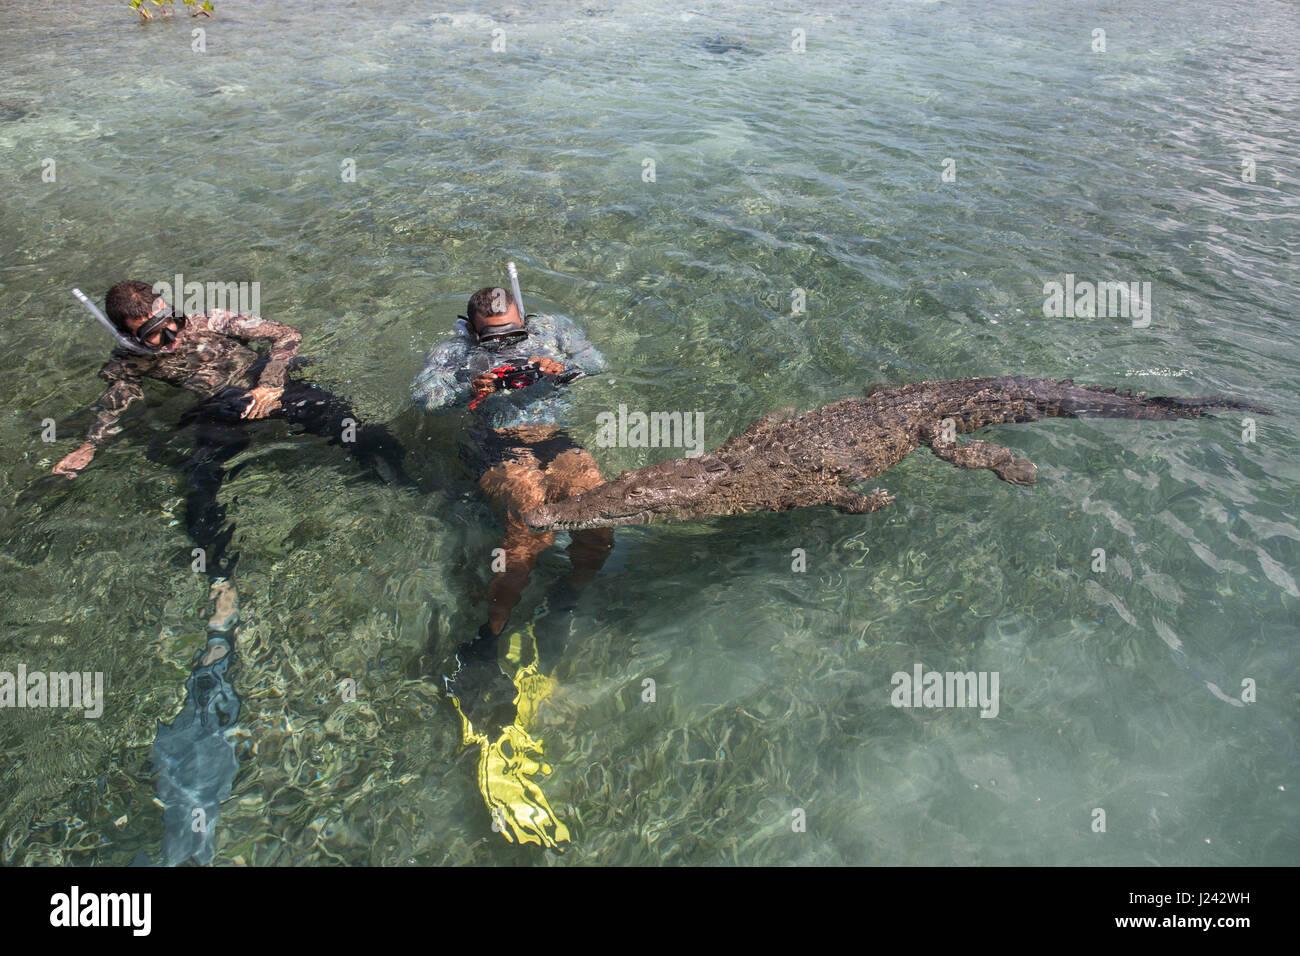 Schnorchler Schwimmen mit Krokodil, Kuba Stockbild